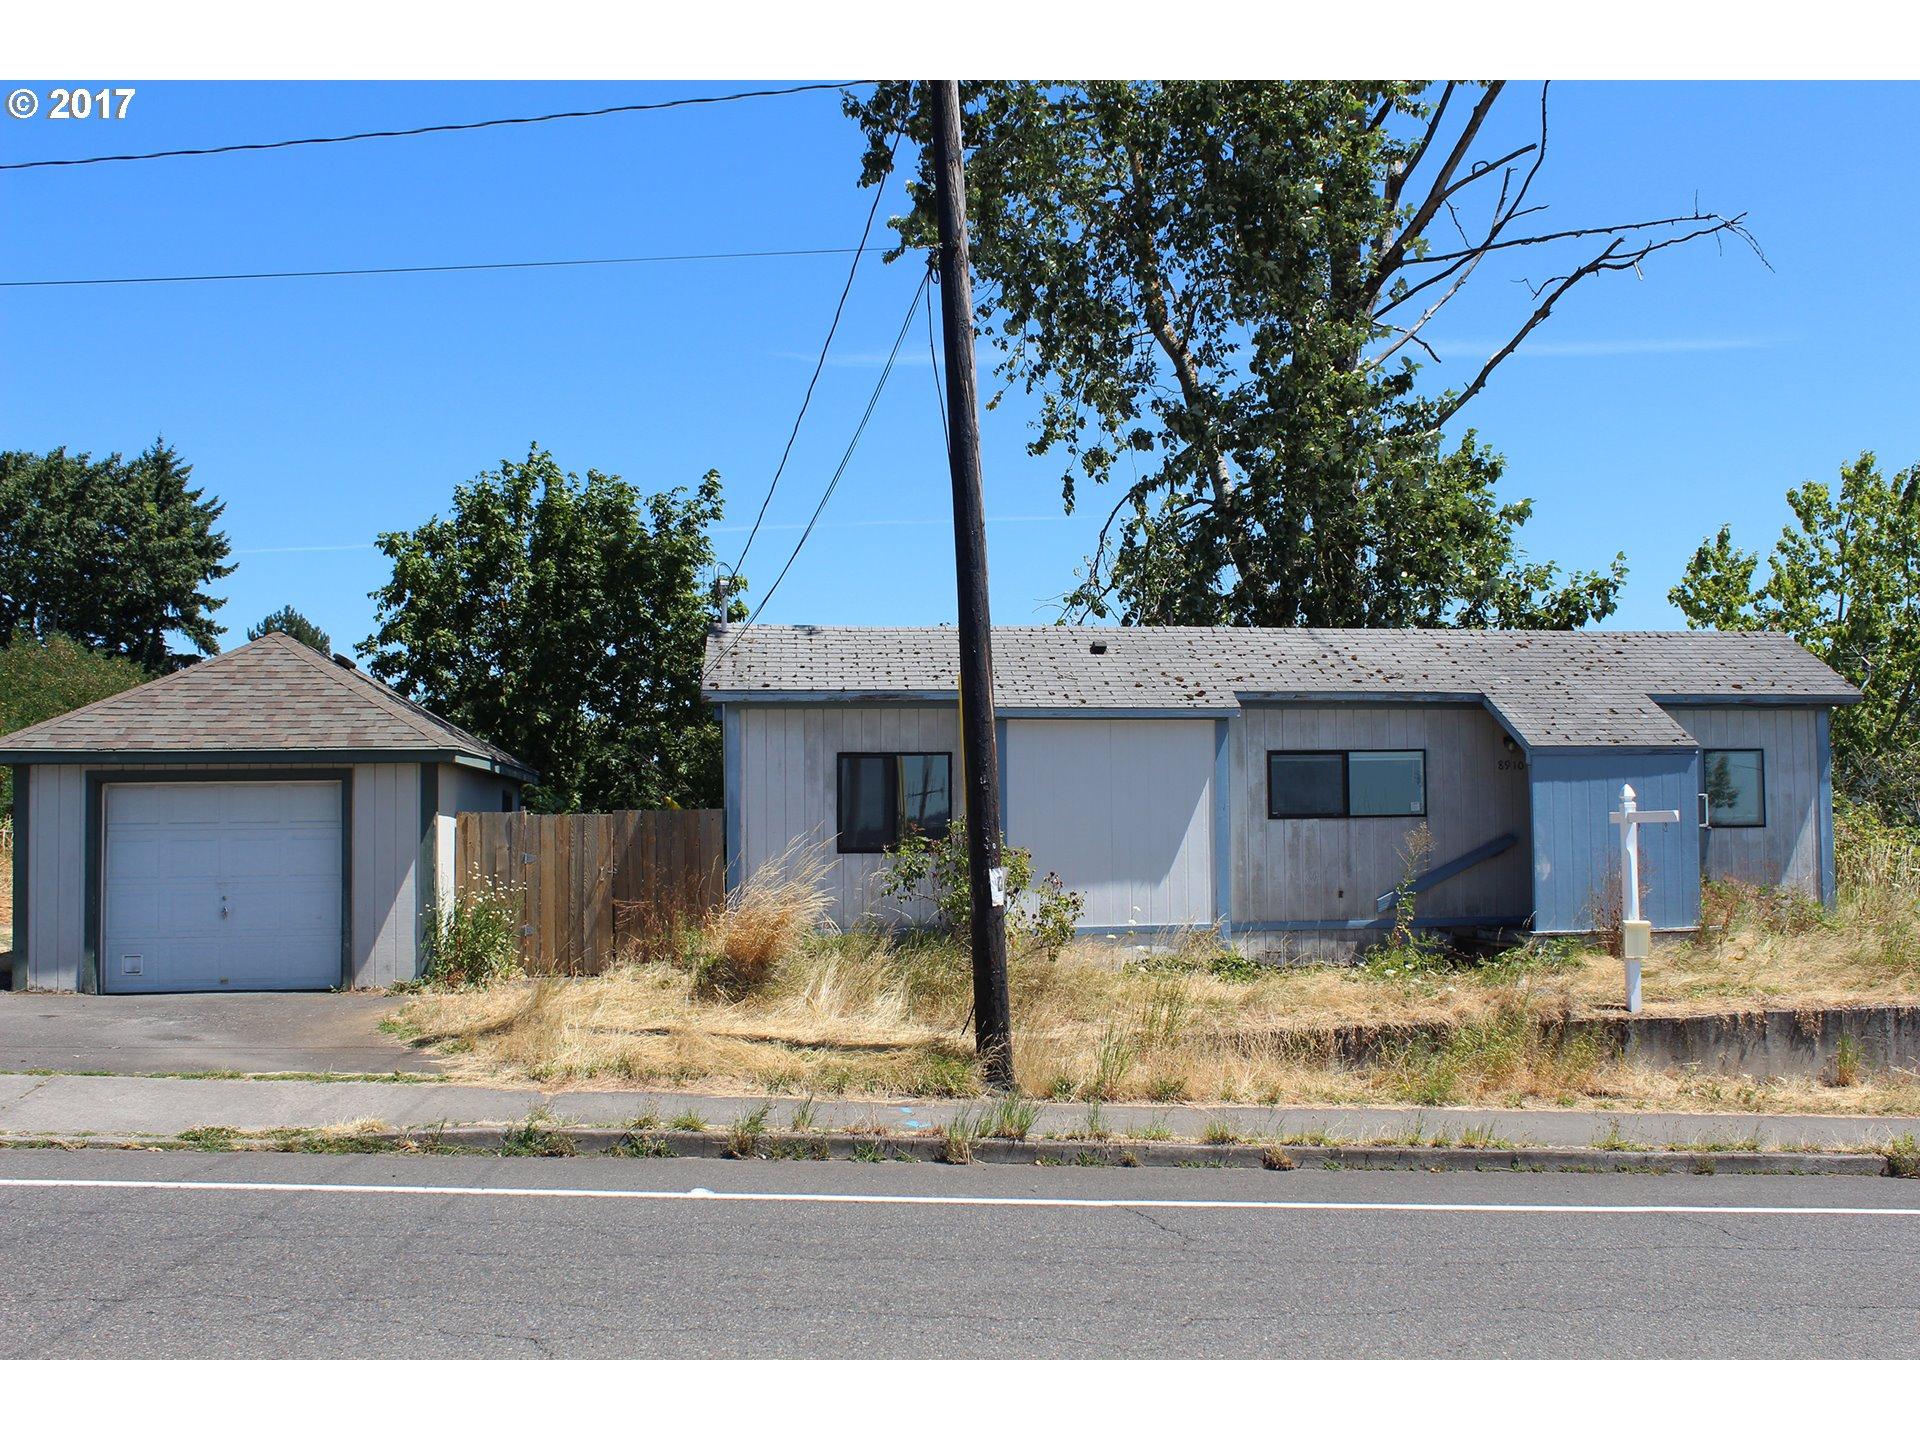 8910 SE FLAVEL DR, Portland, OR 97206